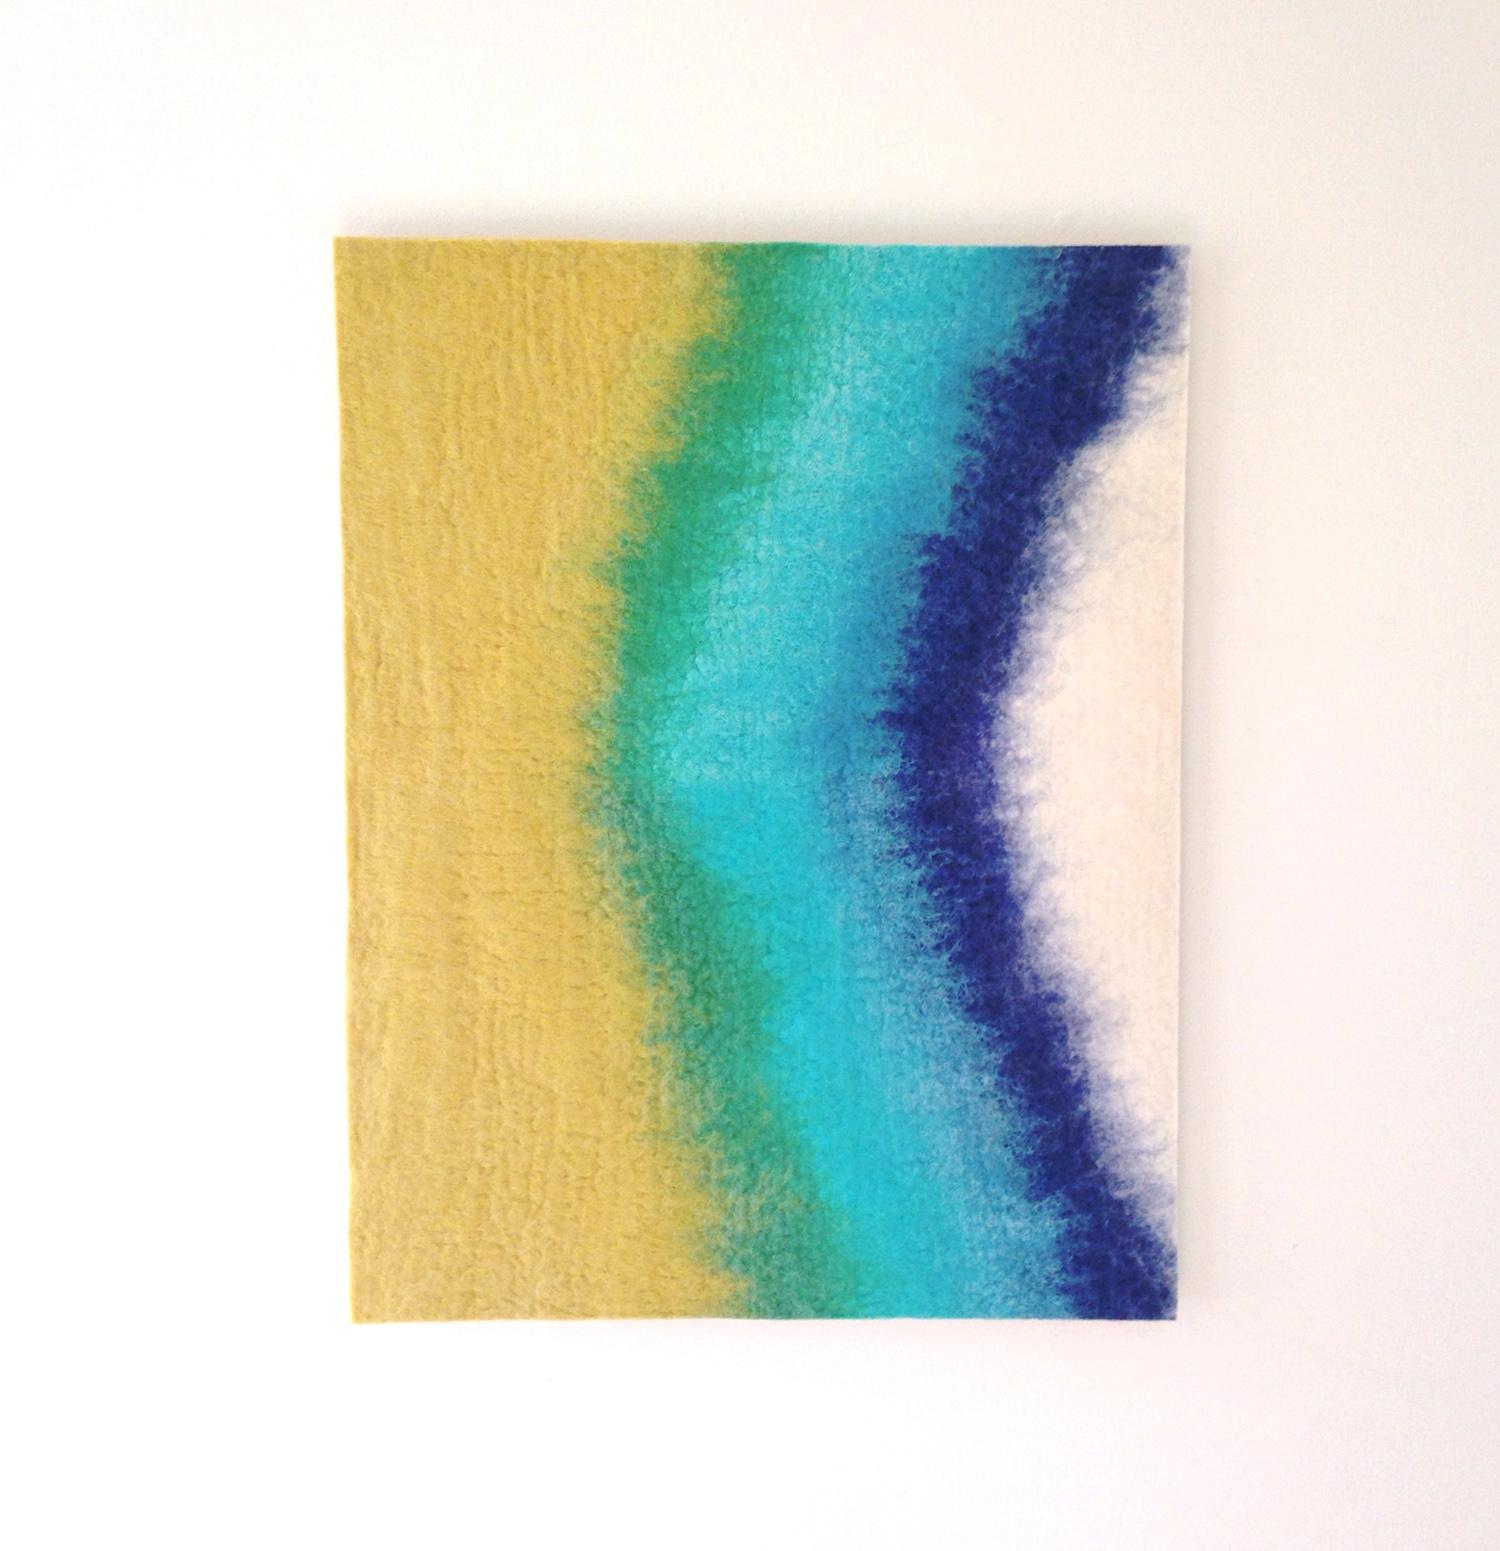 """Color Migration: Chevron"" (pic 1 of 2)"